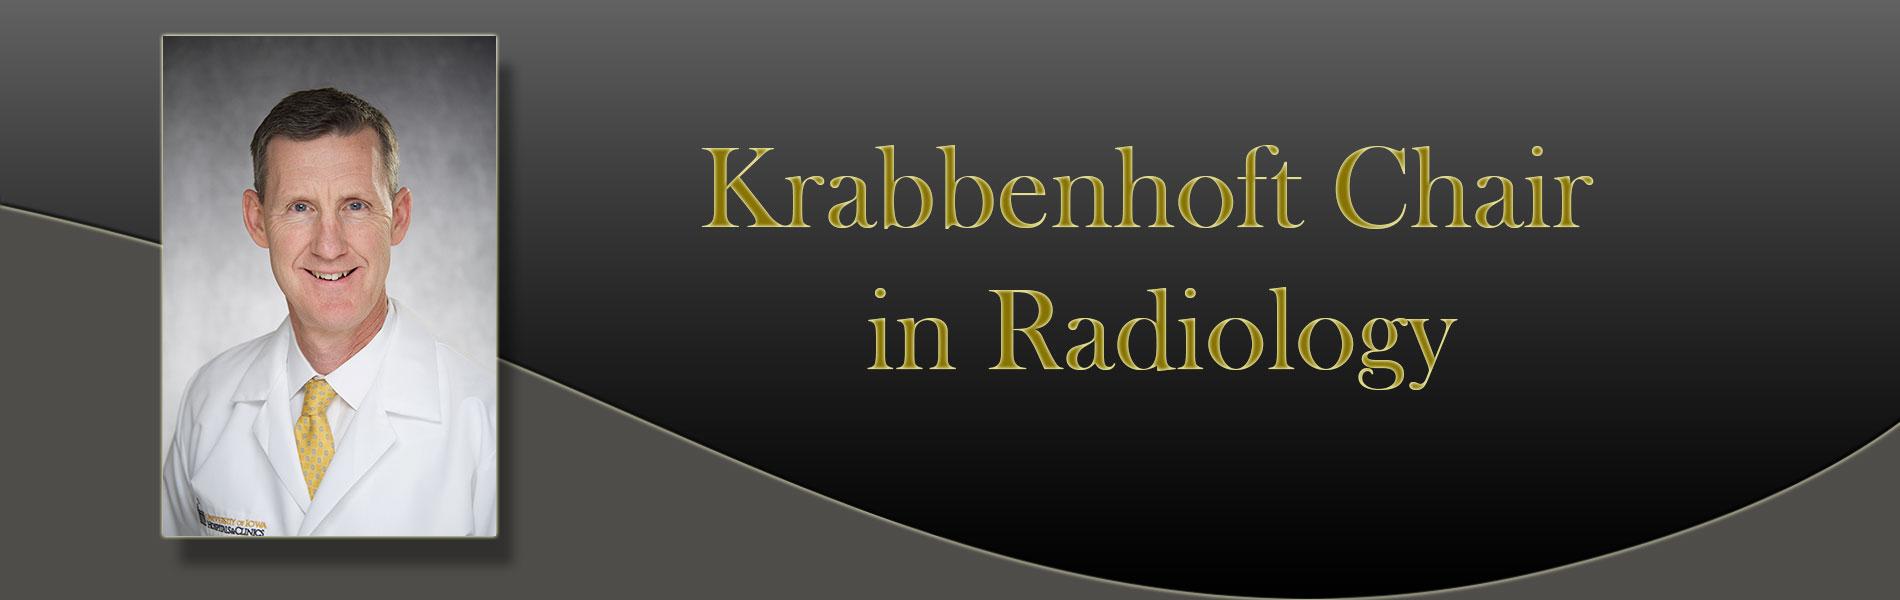 Krabbenhoft Chair Award